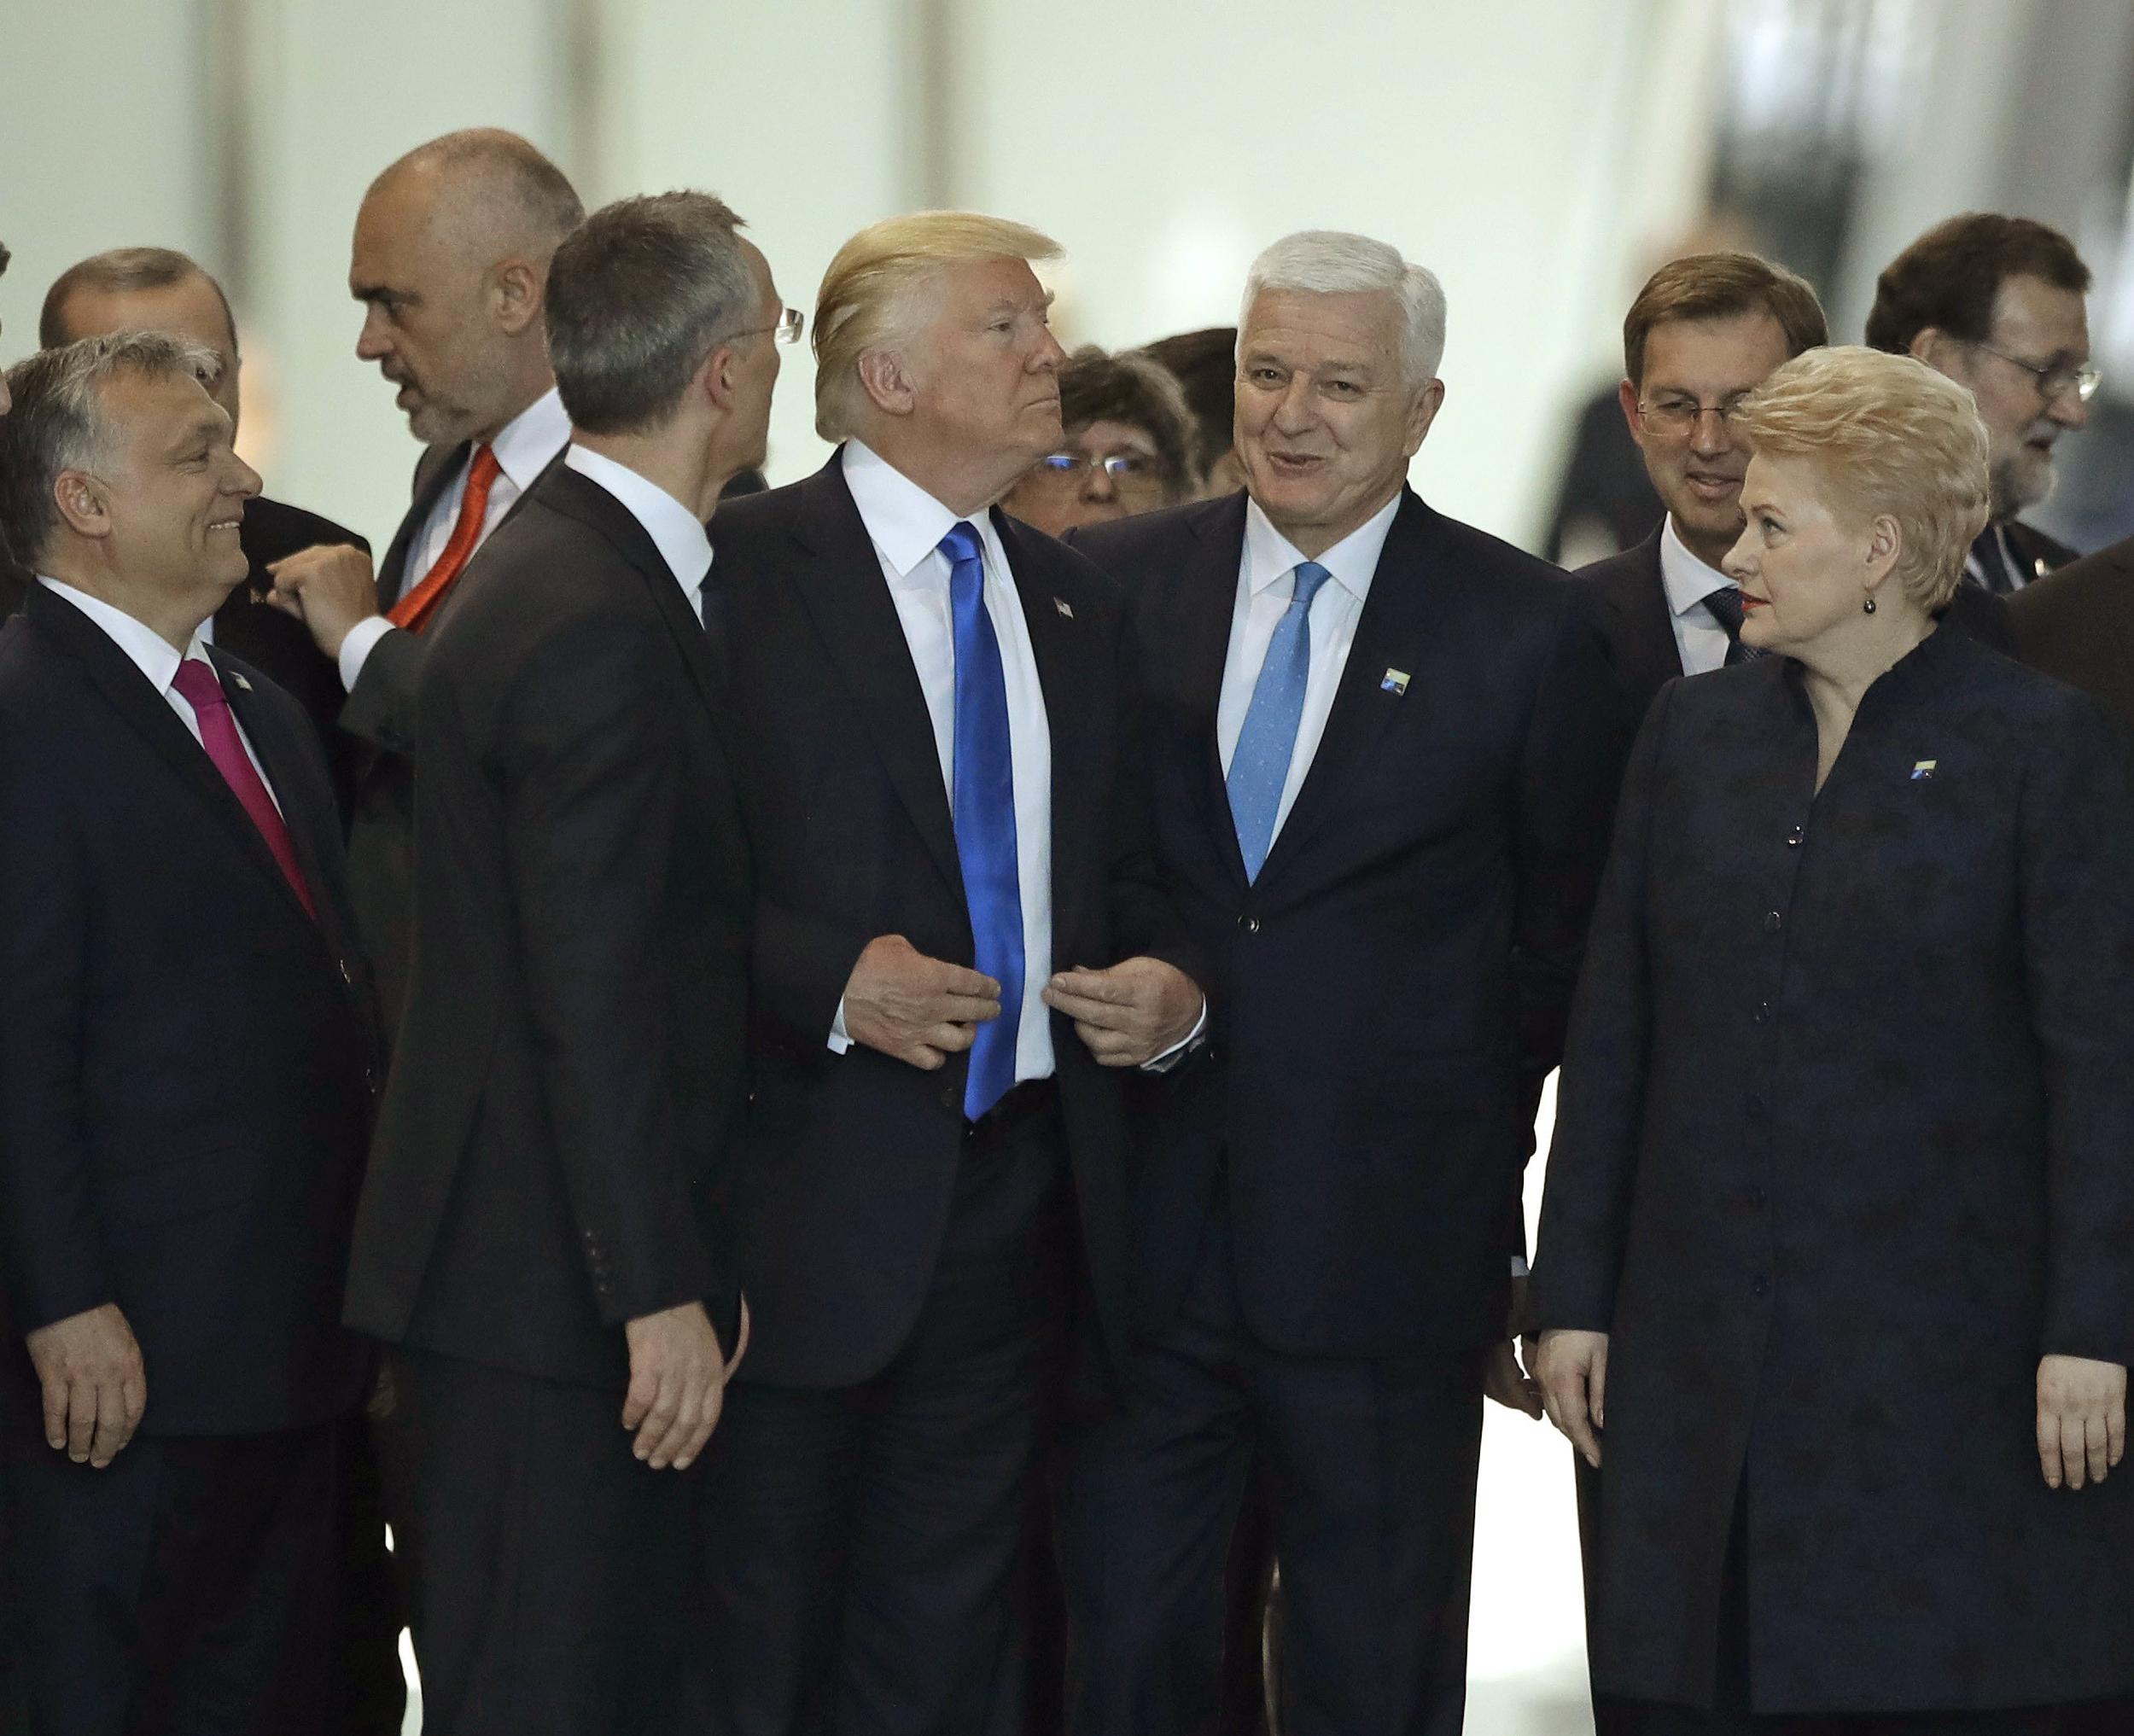 President Trump Throws His Weight Around At Nato Summit